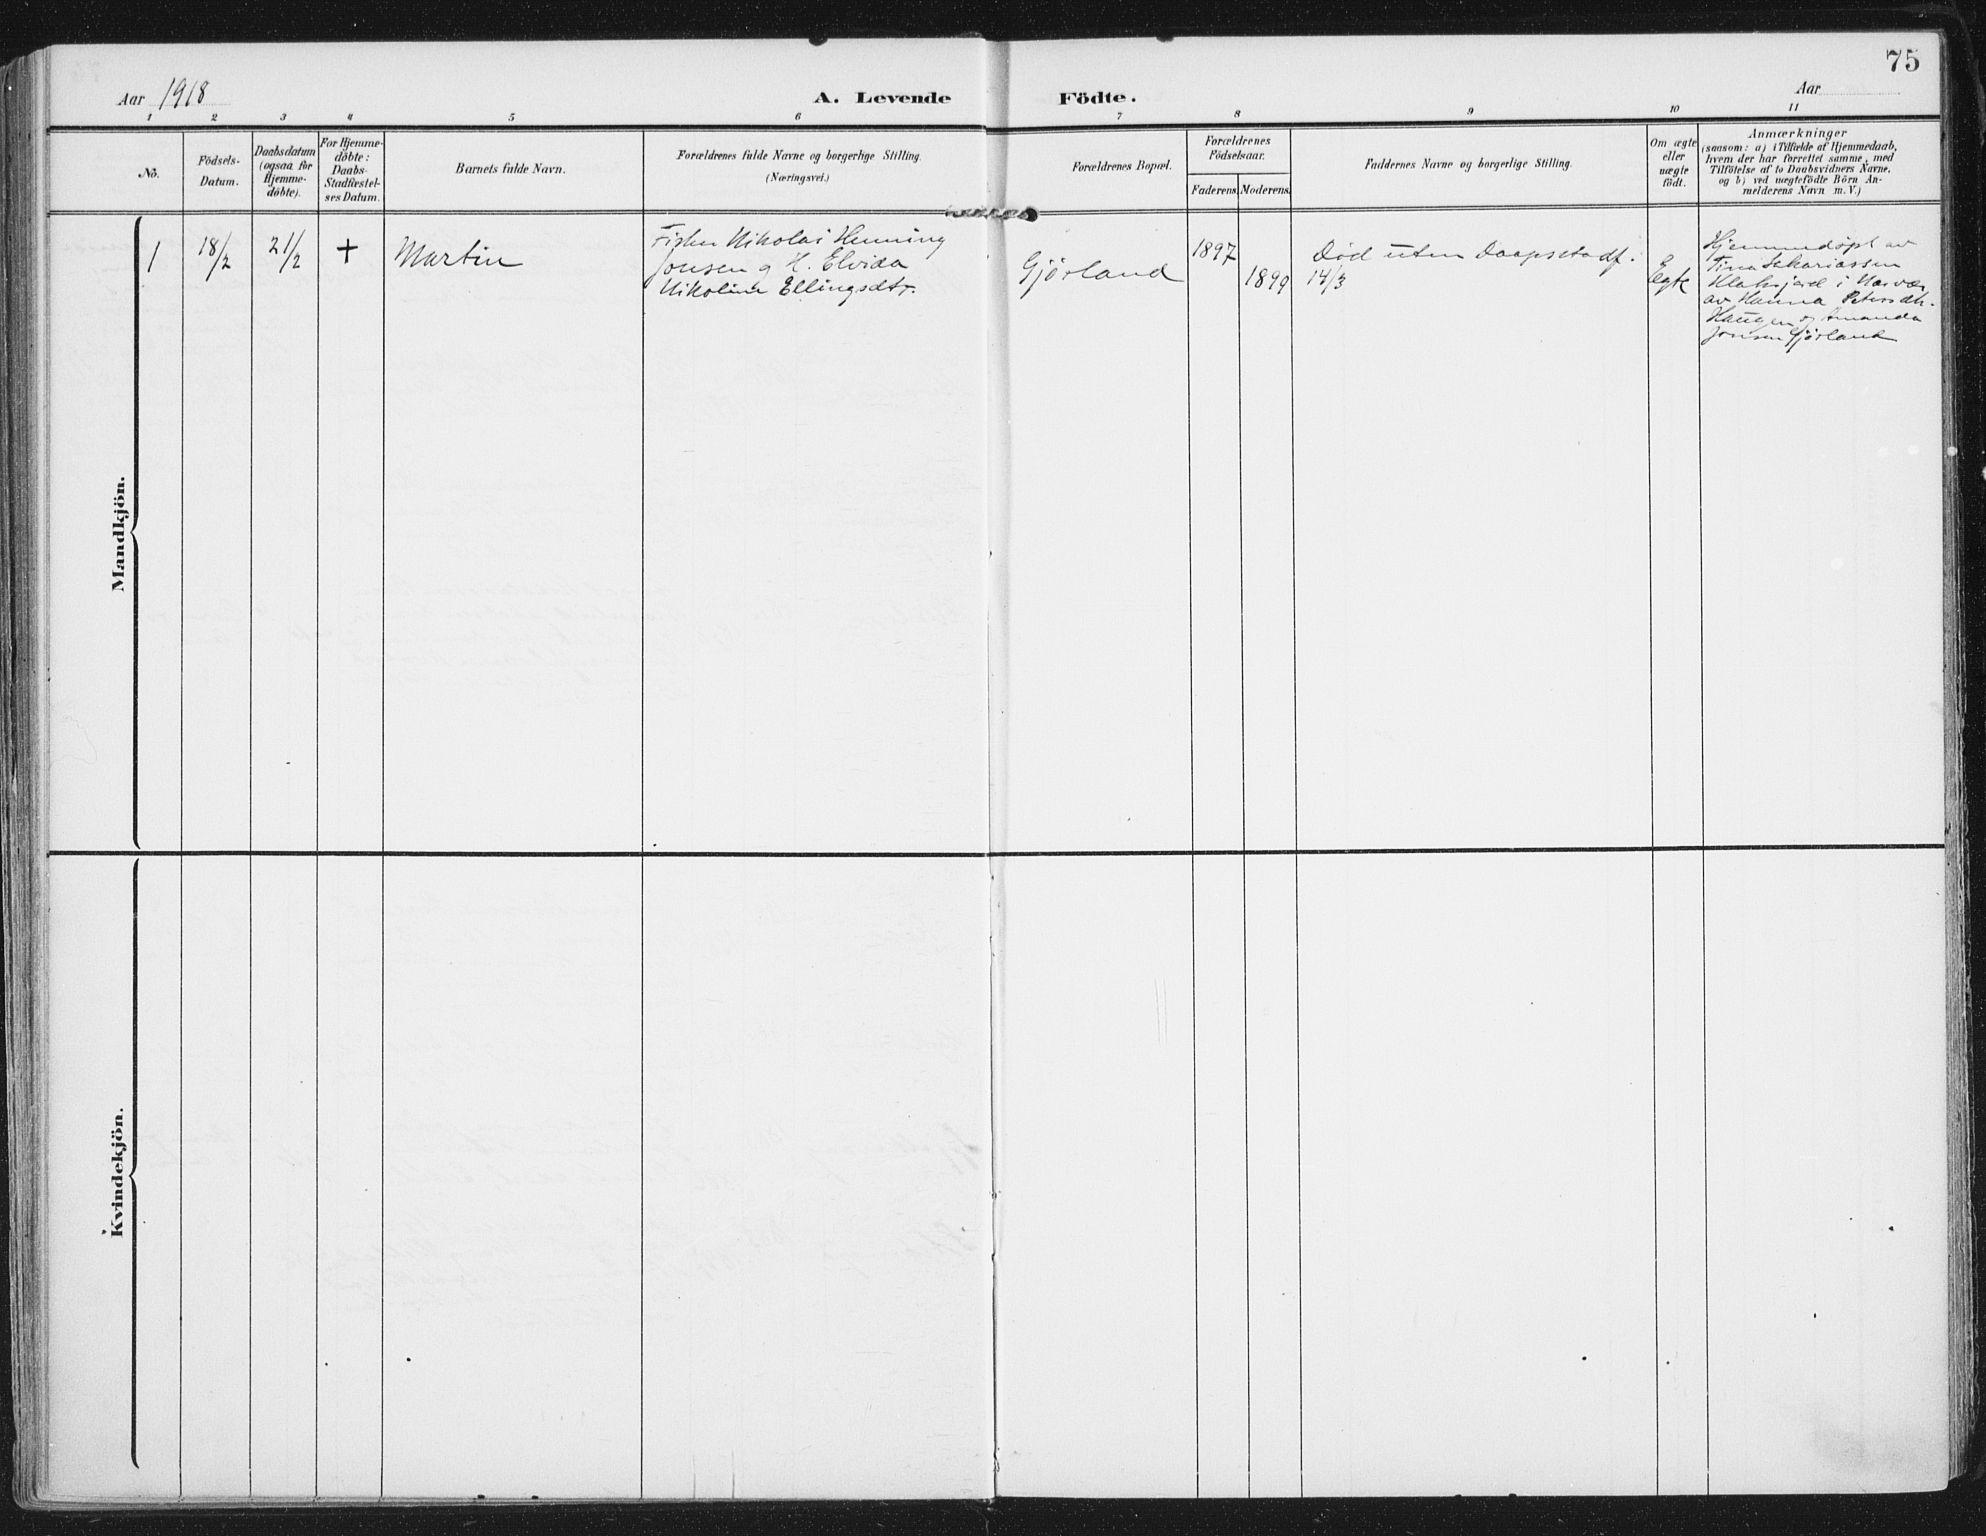 SAT, Ministerialprotokoller, klokkerbøker og fødselsregistre - Nordland, 892/L1321: Ministerialbok nr. 892A02, 1902-1918, s. 75